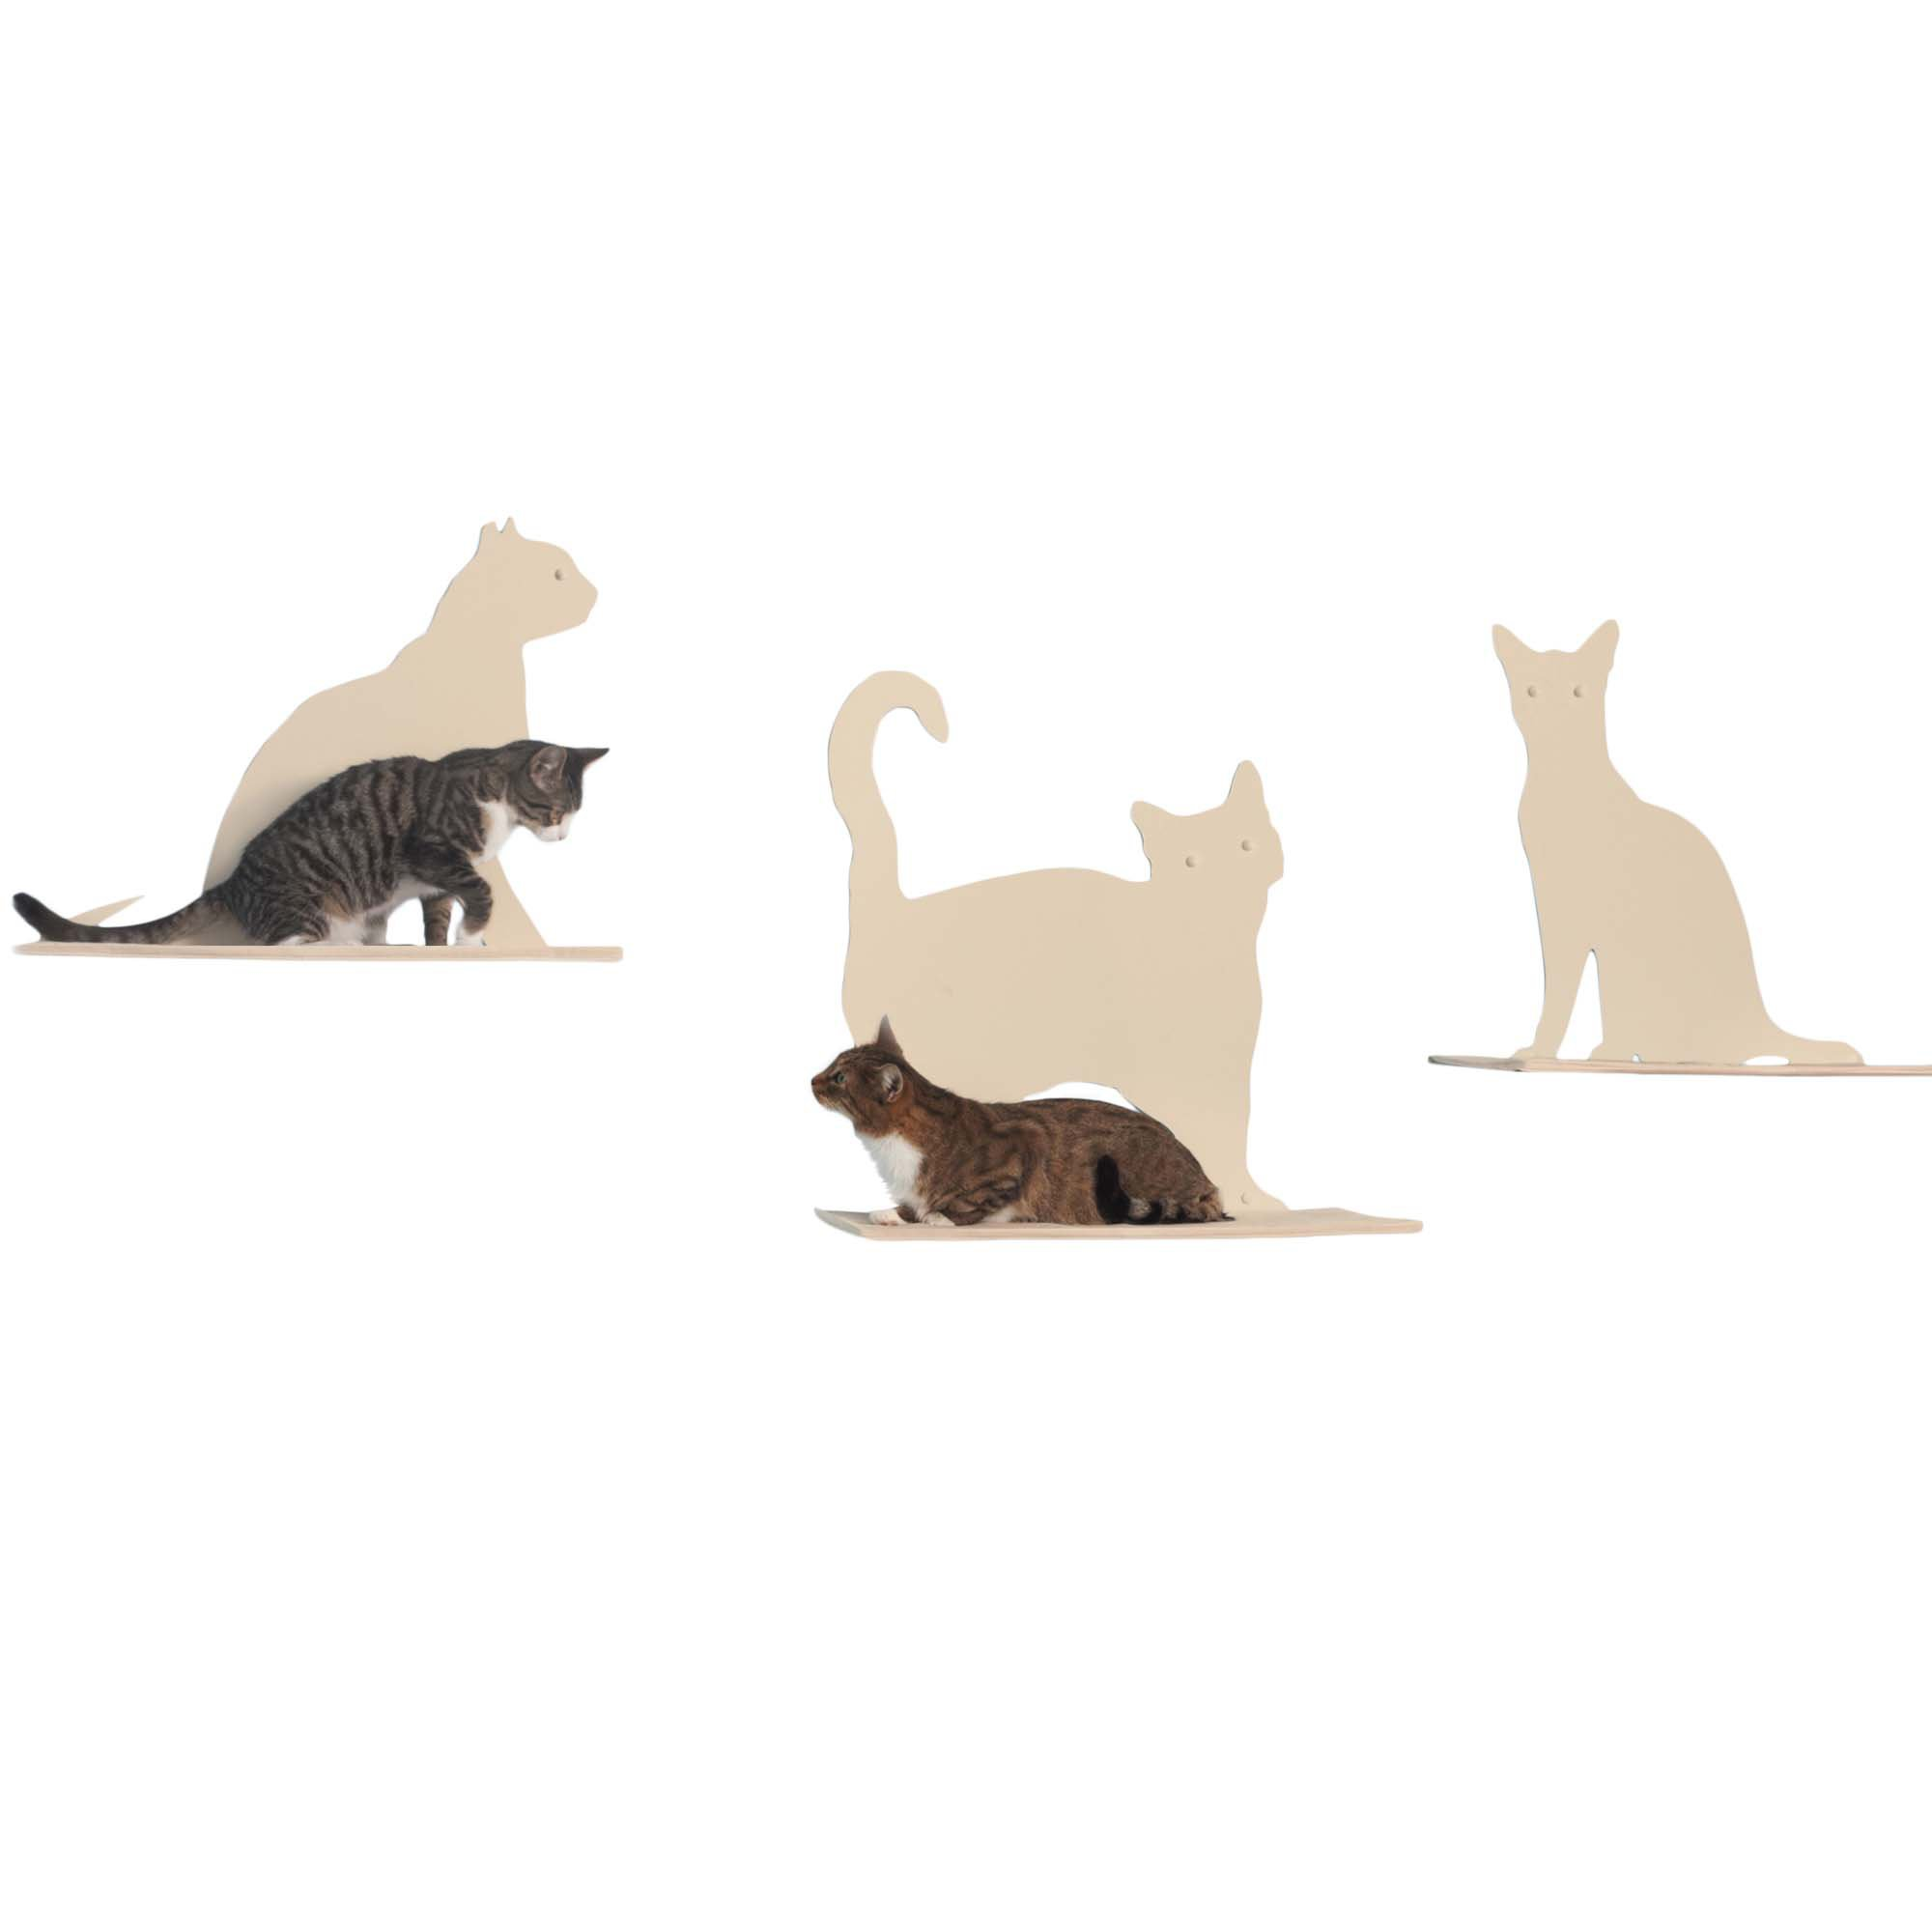 The Refined Feline Silhouette Cat Shelf Set of 3 in Off-White